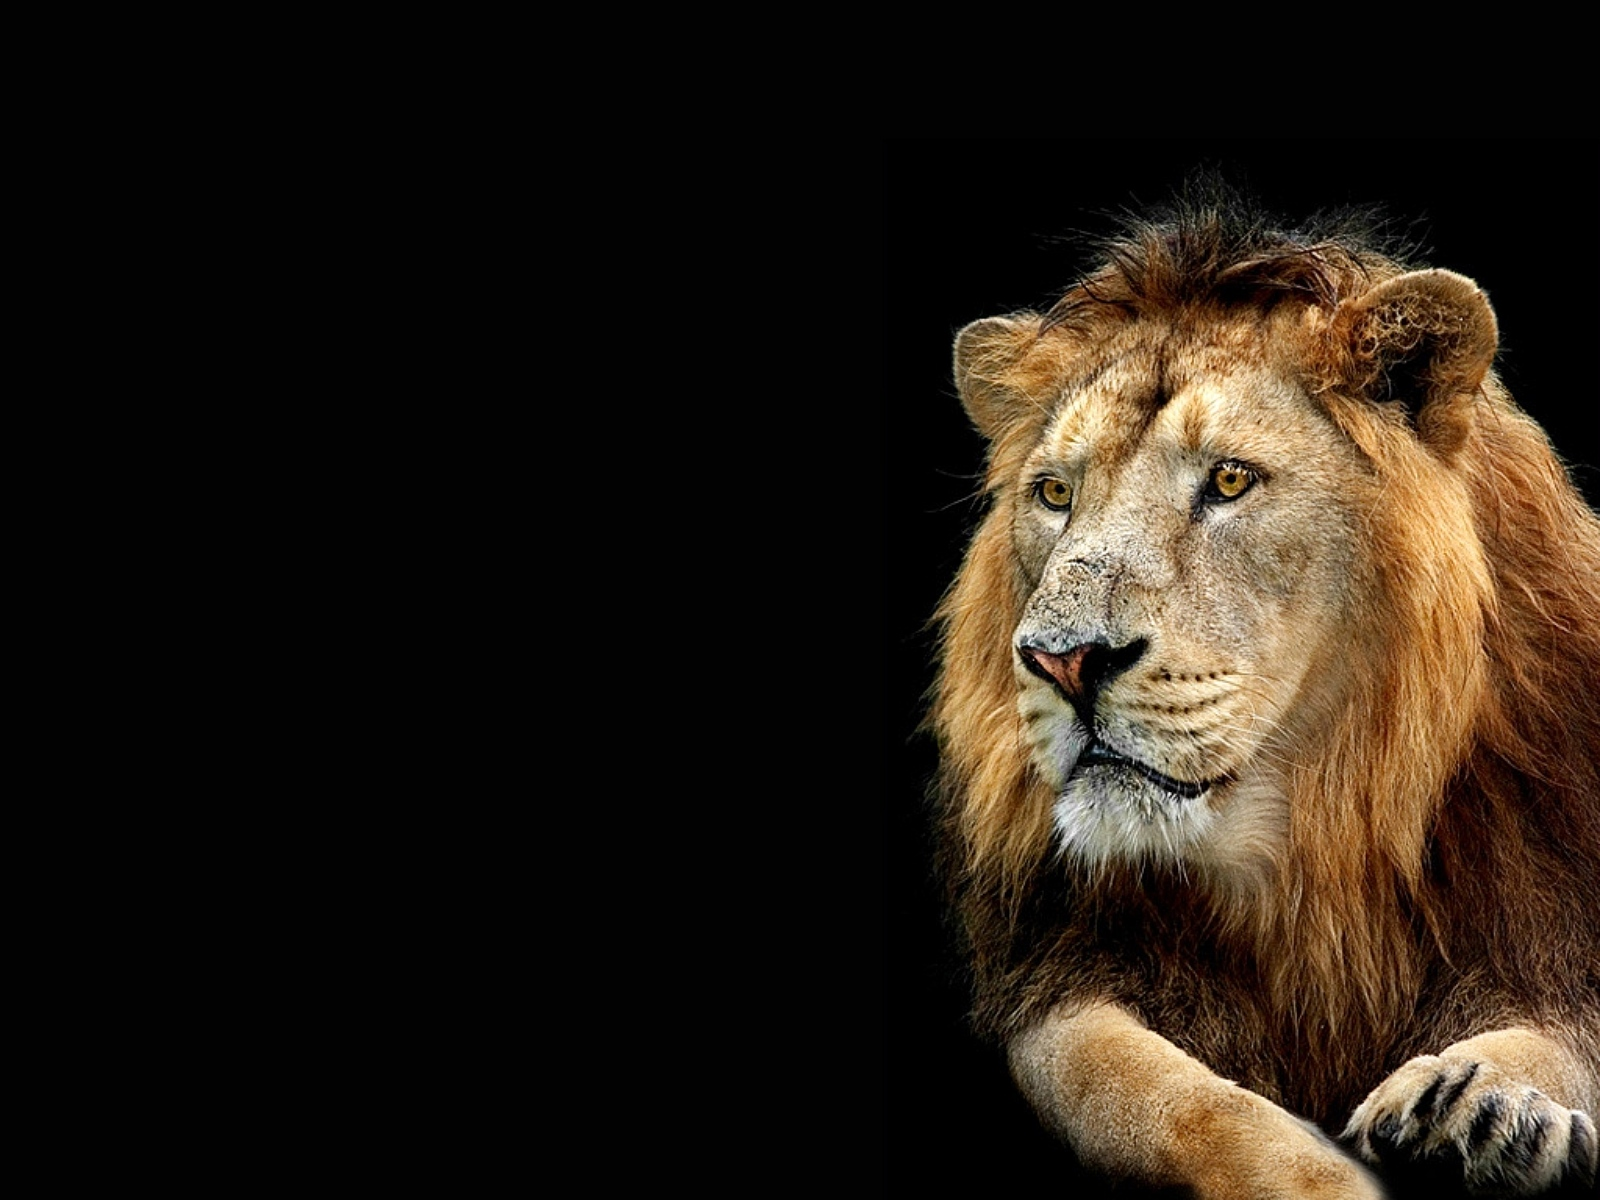 3d Wallpaper Desktop Backgrounds Lion Wallpapersafari - Lion Wallpaper With Quotes - HD Wallpaper